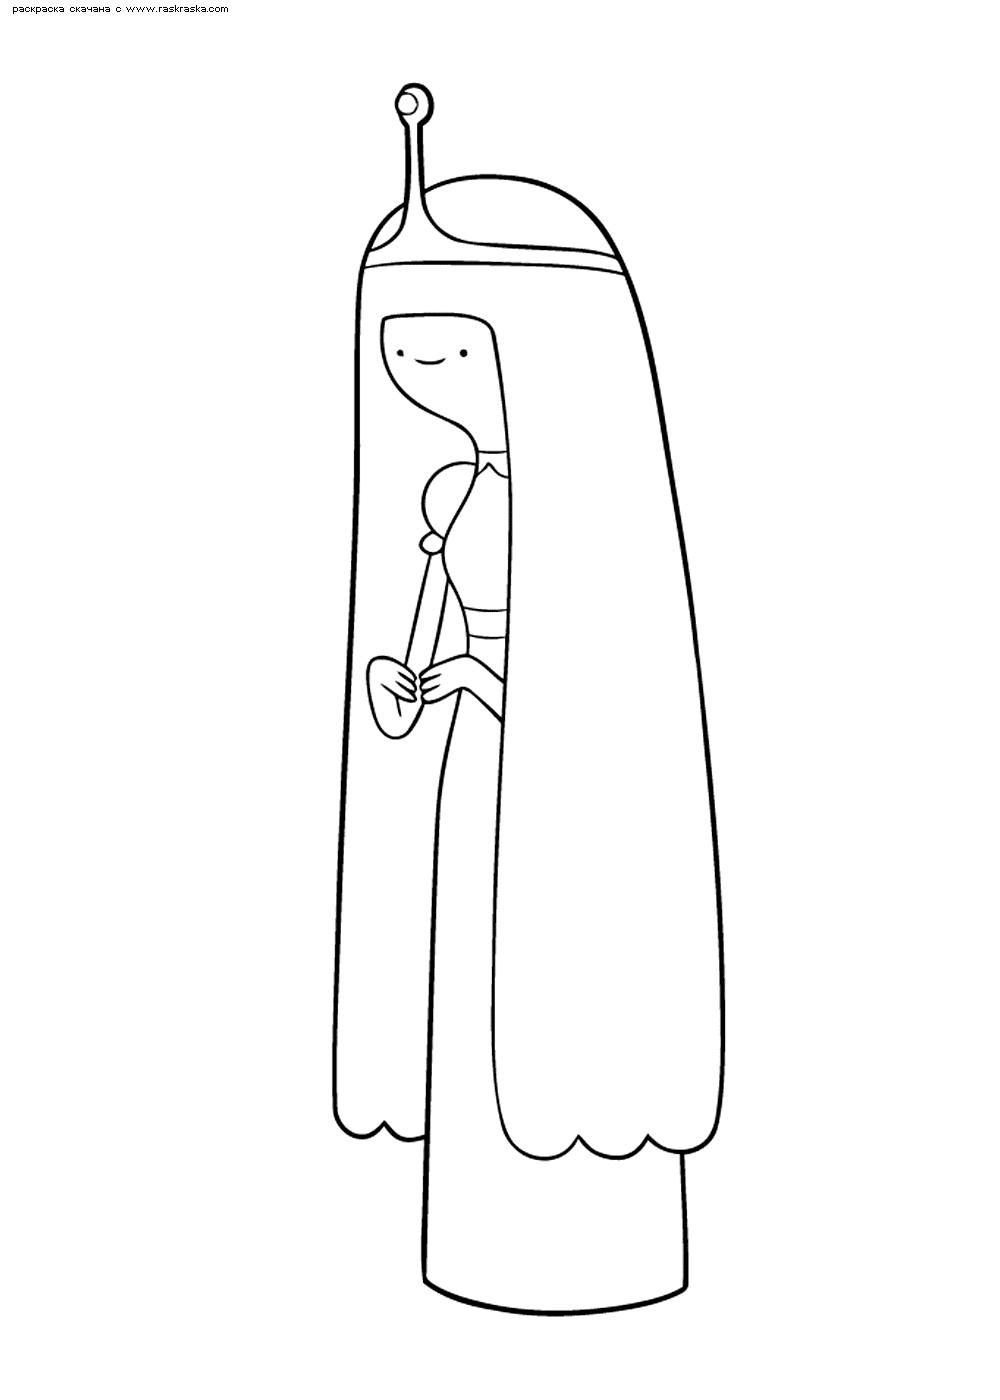 Раскраска Принцесса Бубльгум. Раскраска Принцесса Жвачка, Время приключений